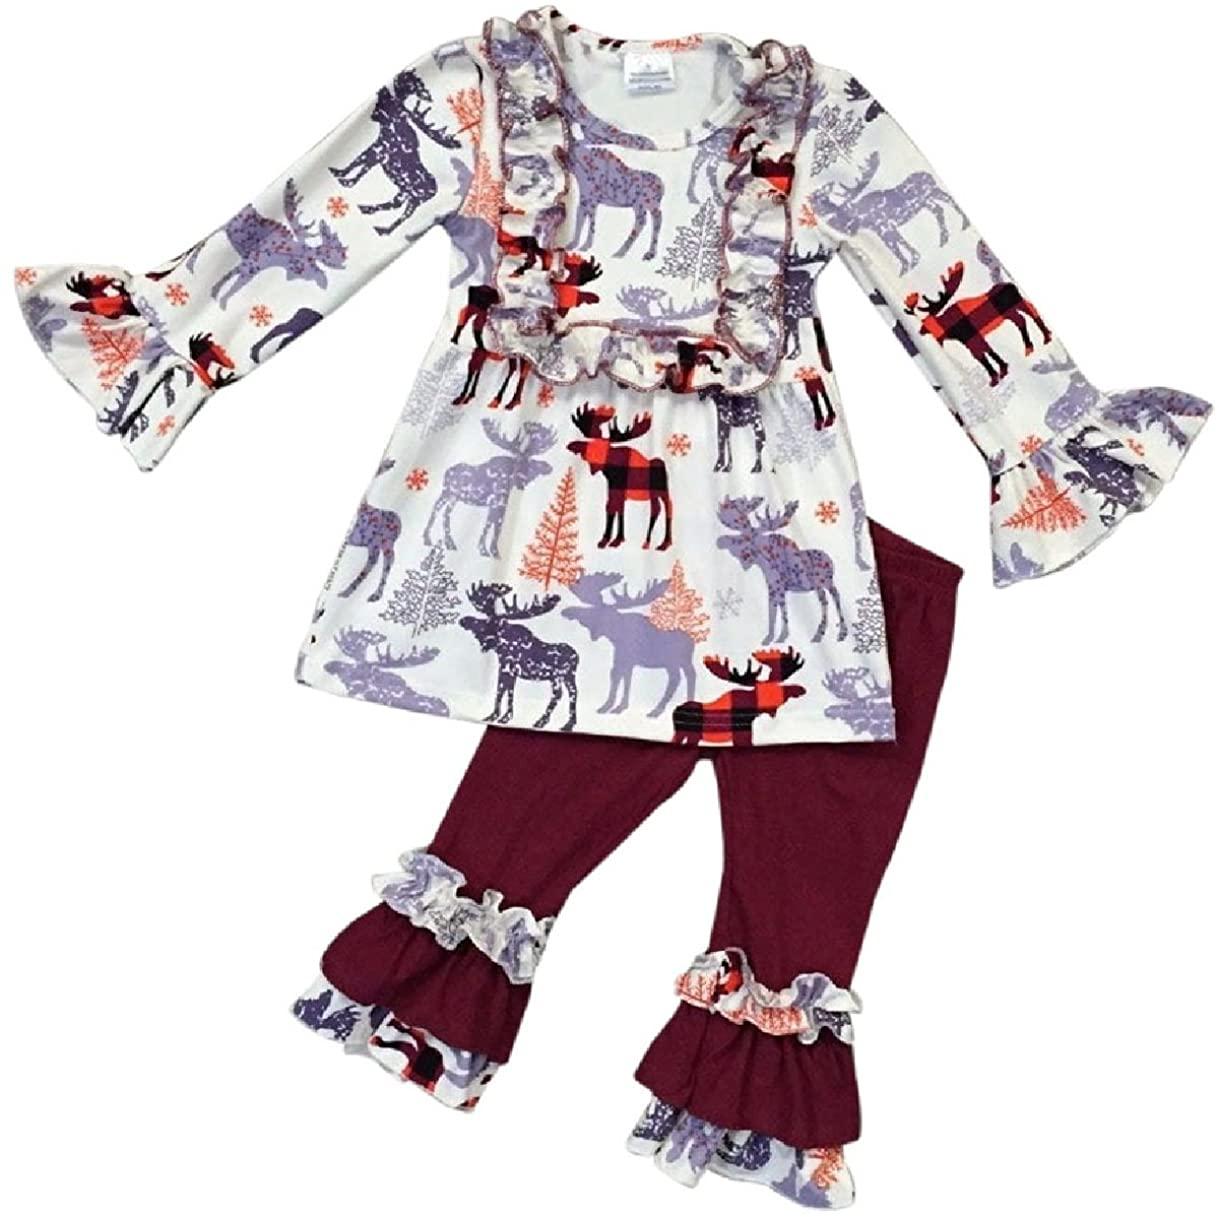 Girls 2 Pieces Dress Set Reindeer Ruffle Dress Legging Pant Clothing Set 2T-8